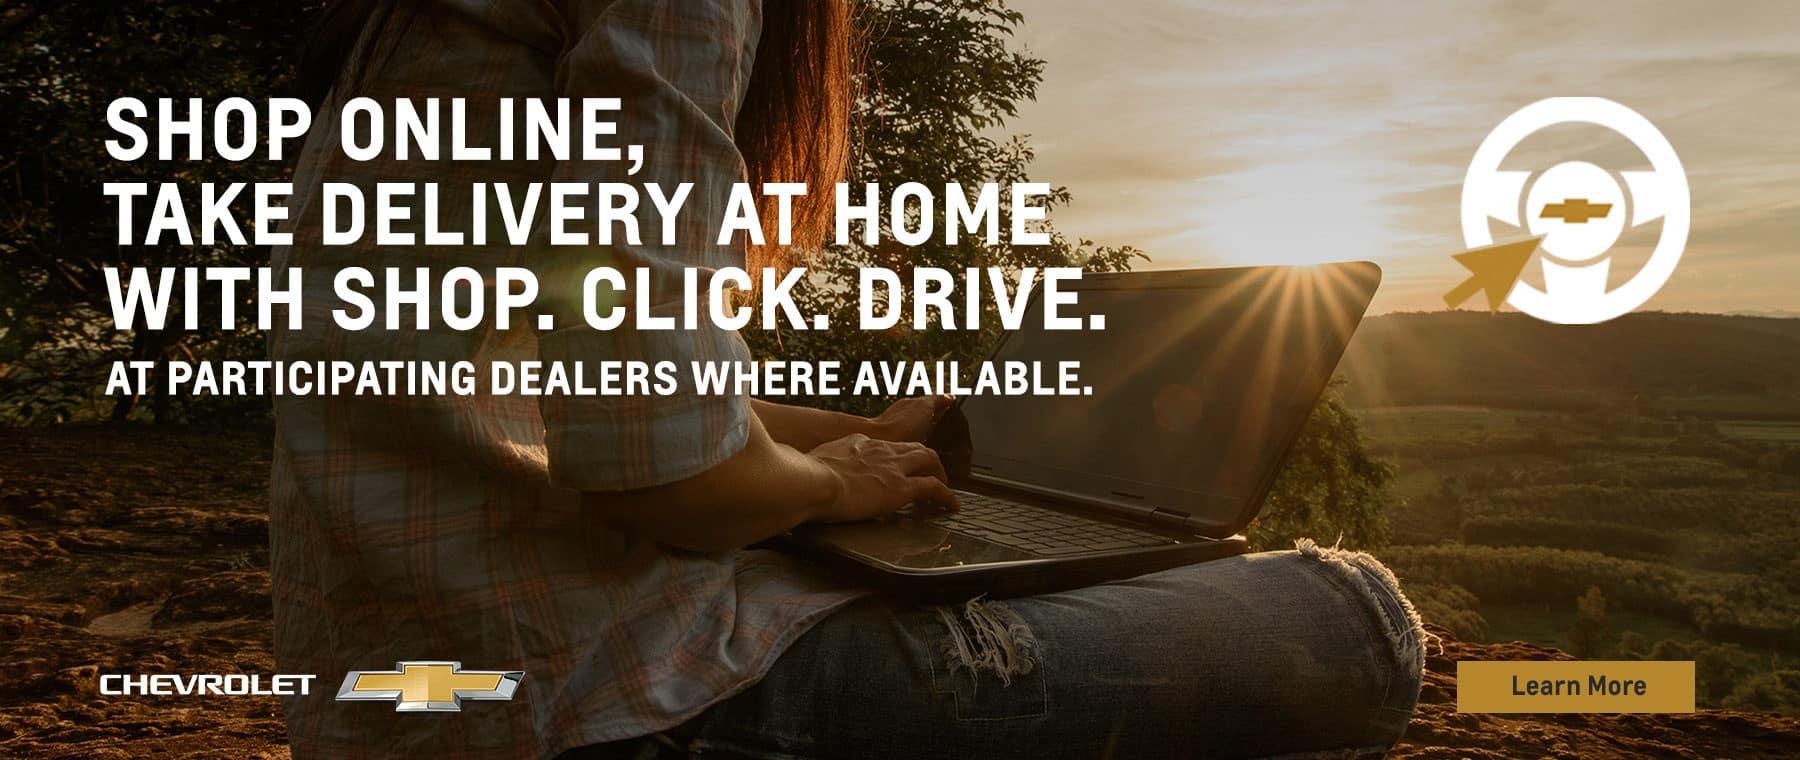 Shop Online, get home delivery